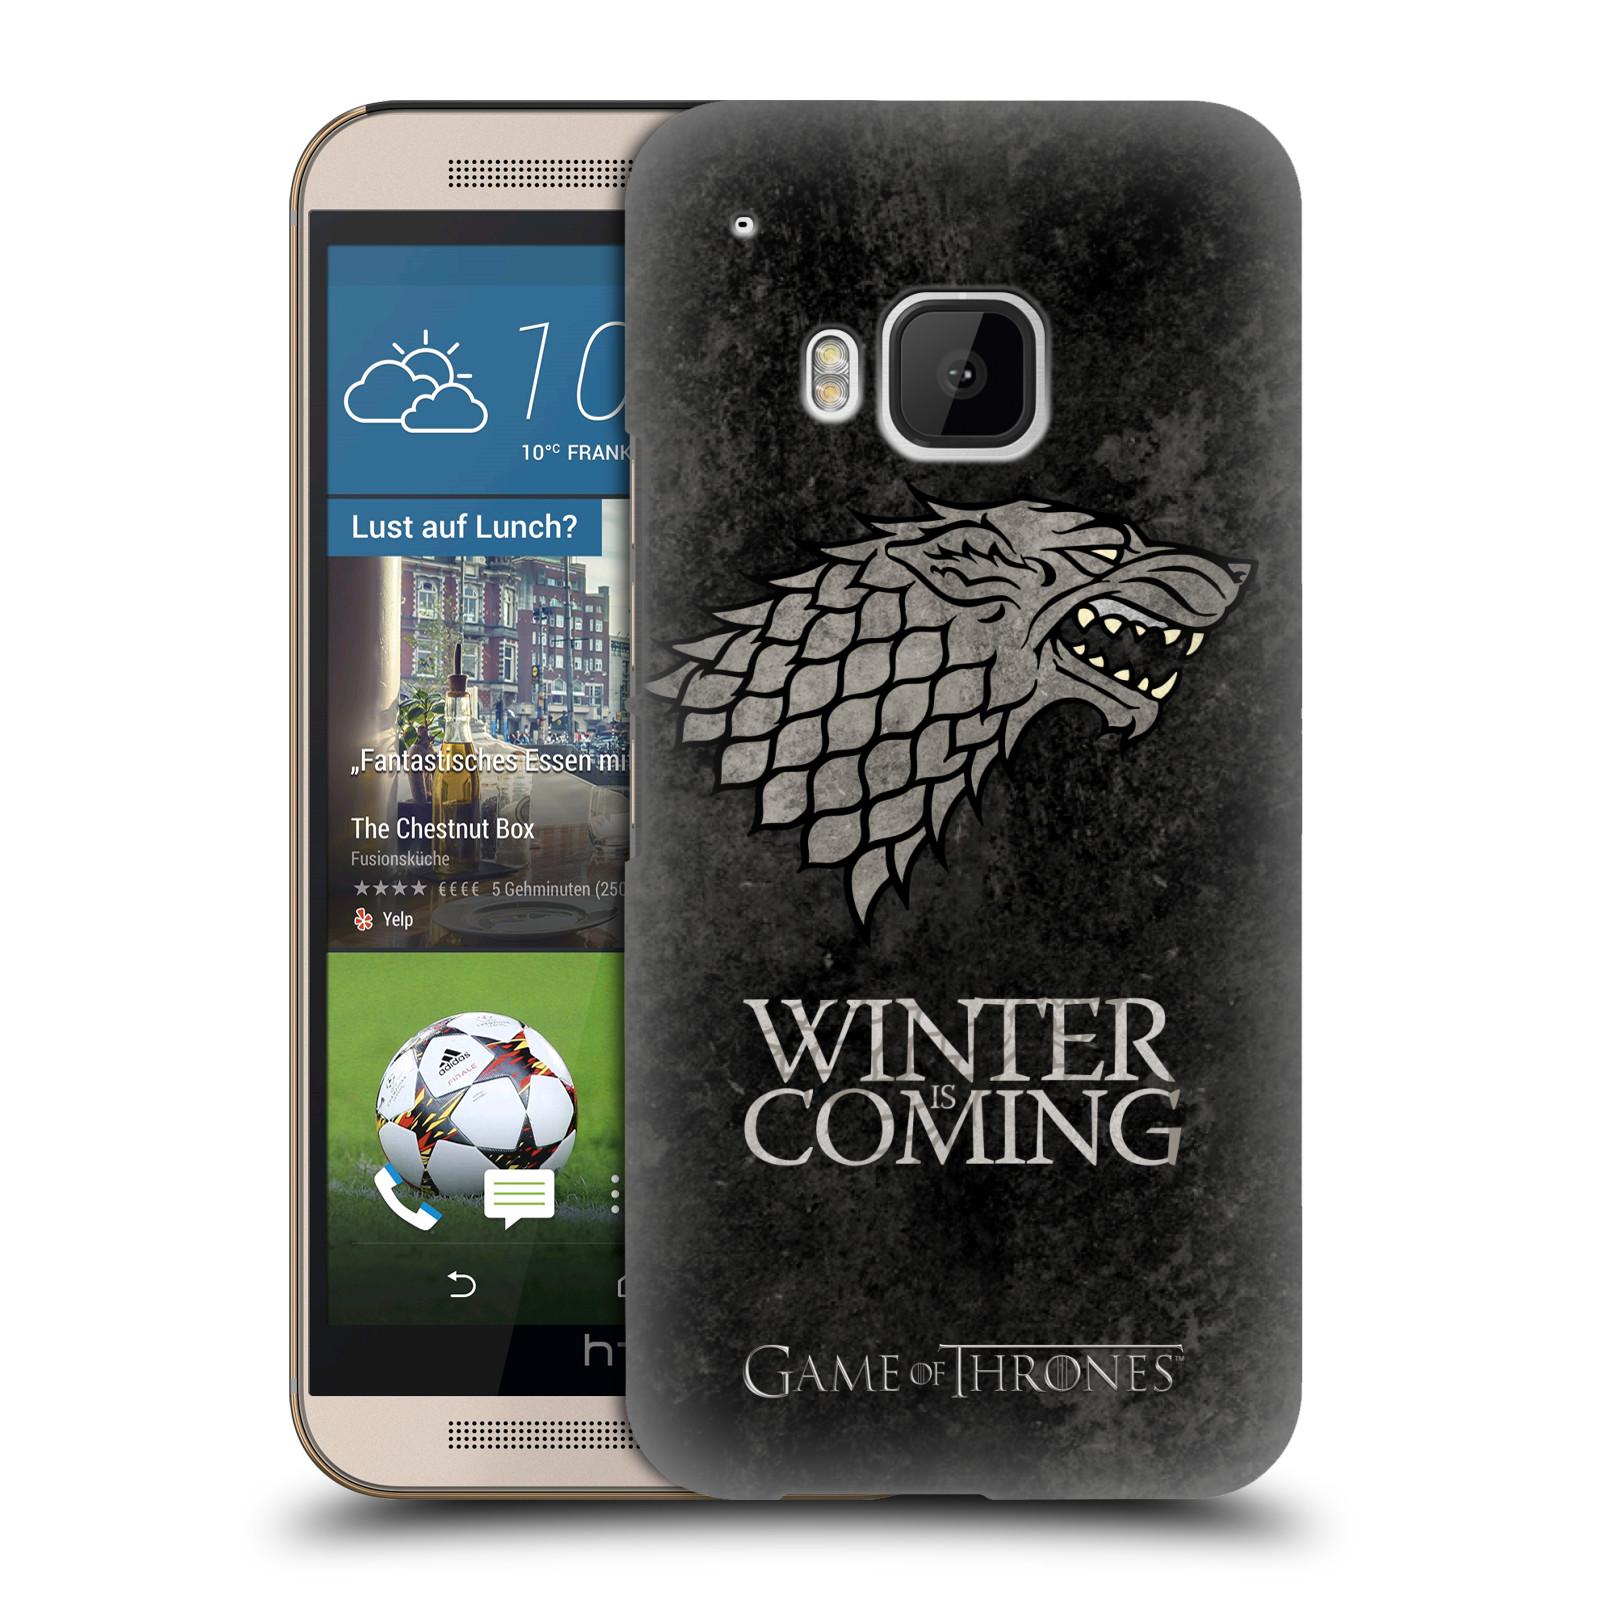 Plastové pouzdro na mobil HTC ONE M9 HEAD CASE Hra o trůny - Stark - Winter is coming